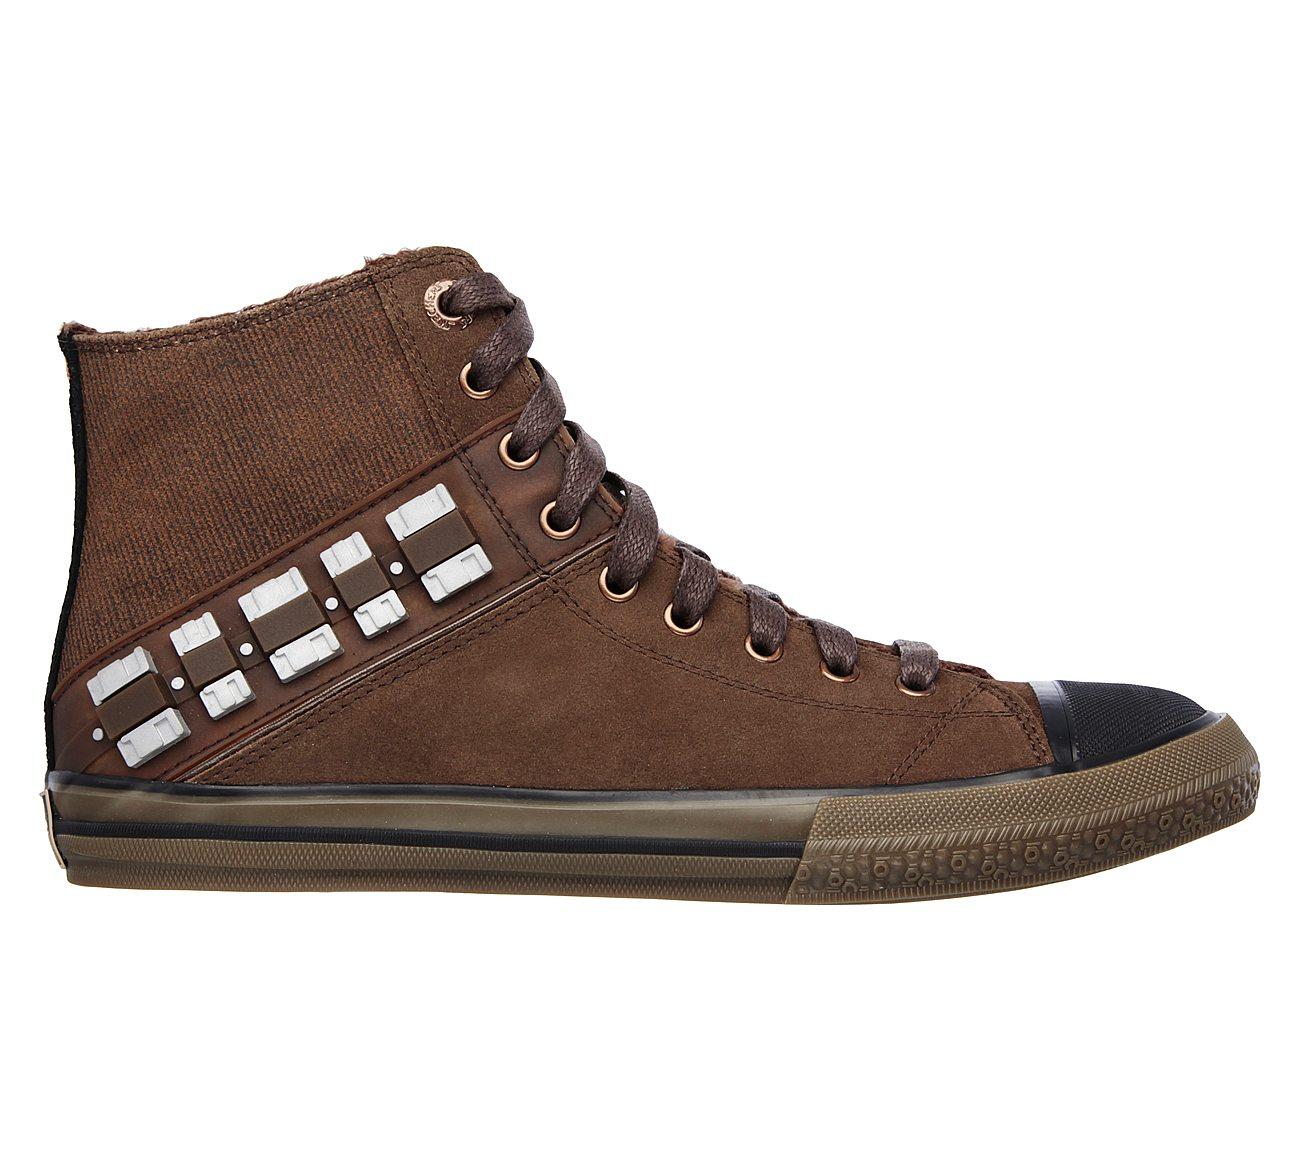 1dec5a42 Buy SKECHERS Star Wars: Legacy Vulc - Chewie Athletic Sneakers Shoes ...